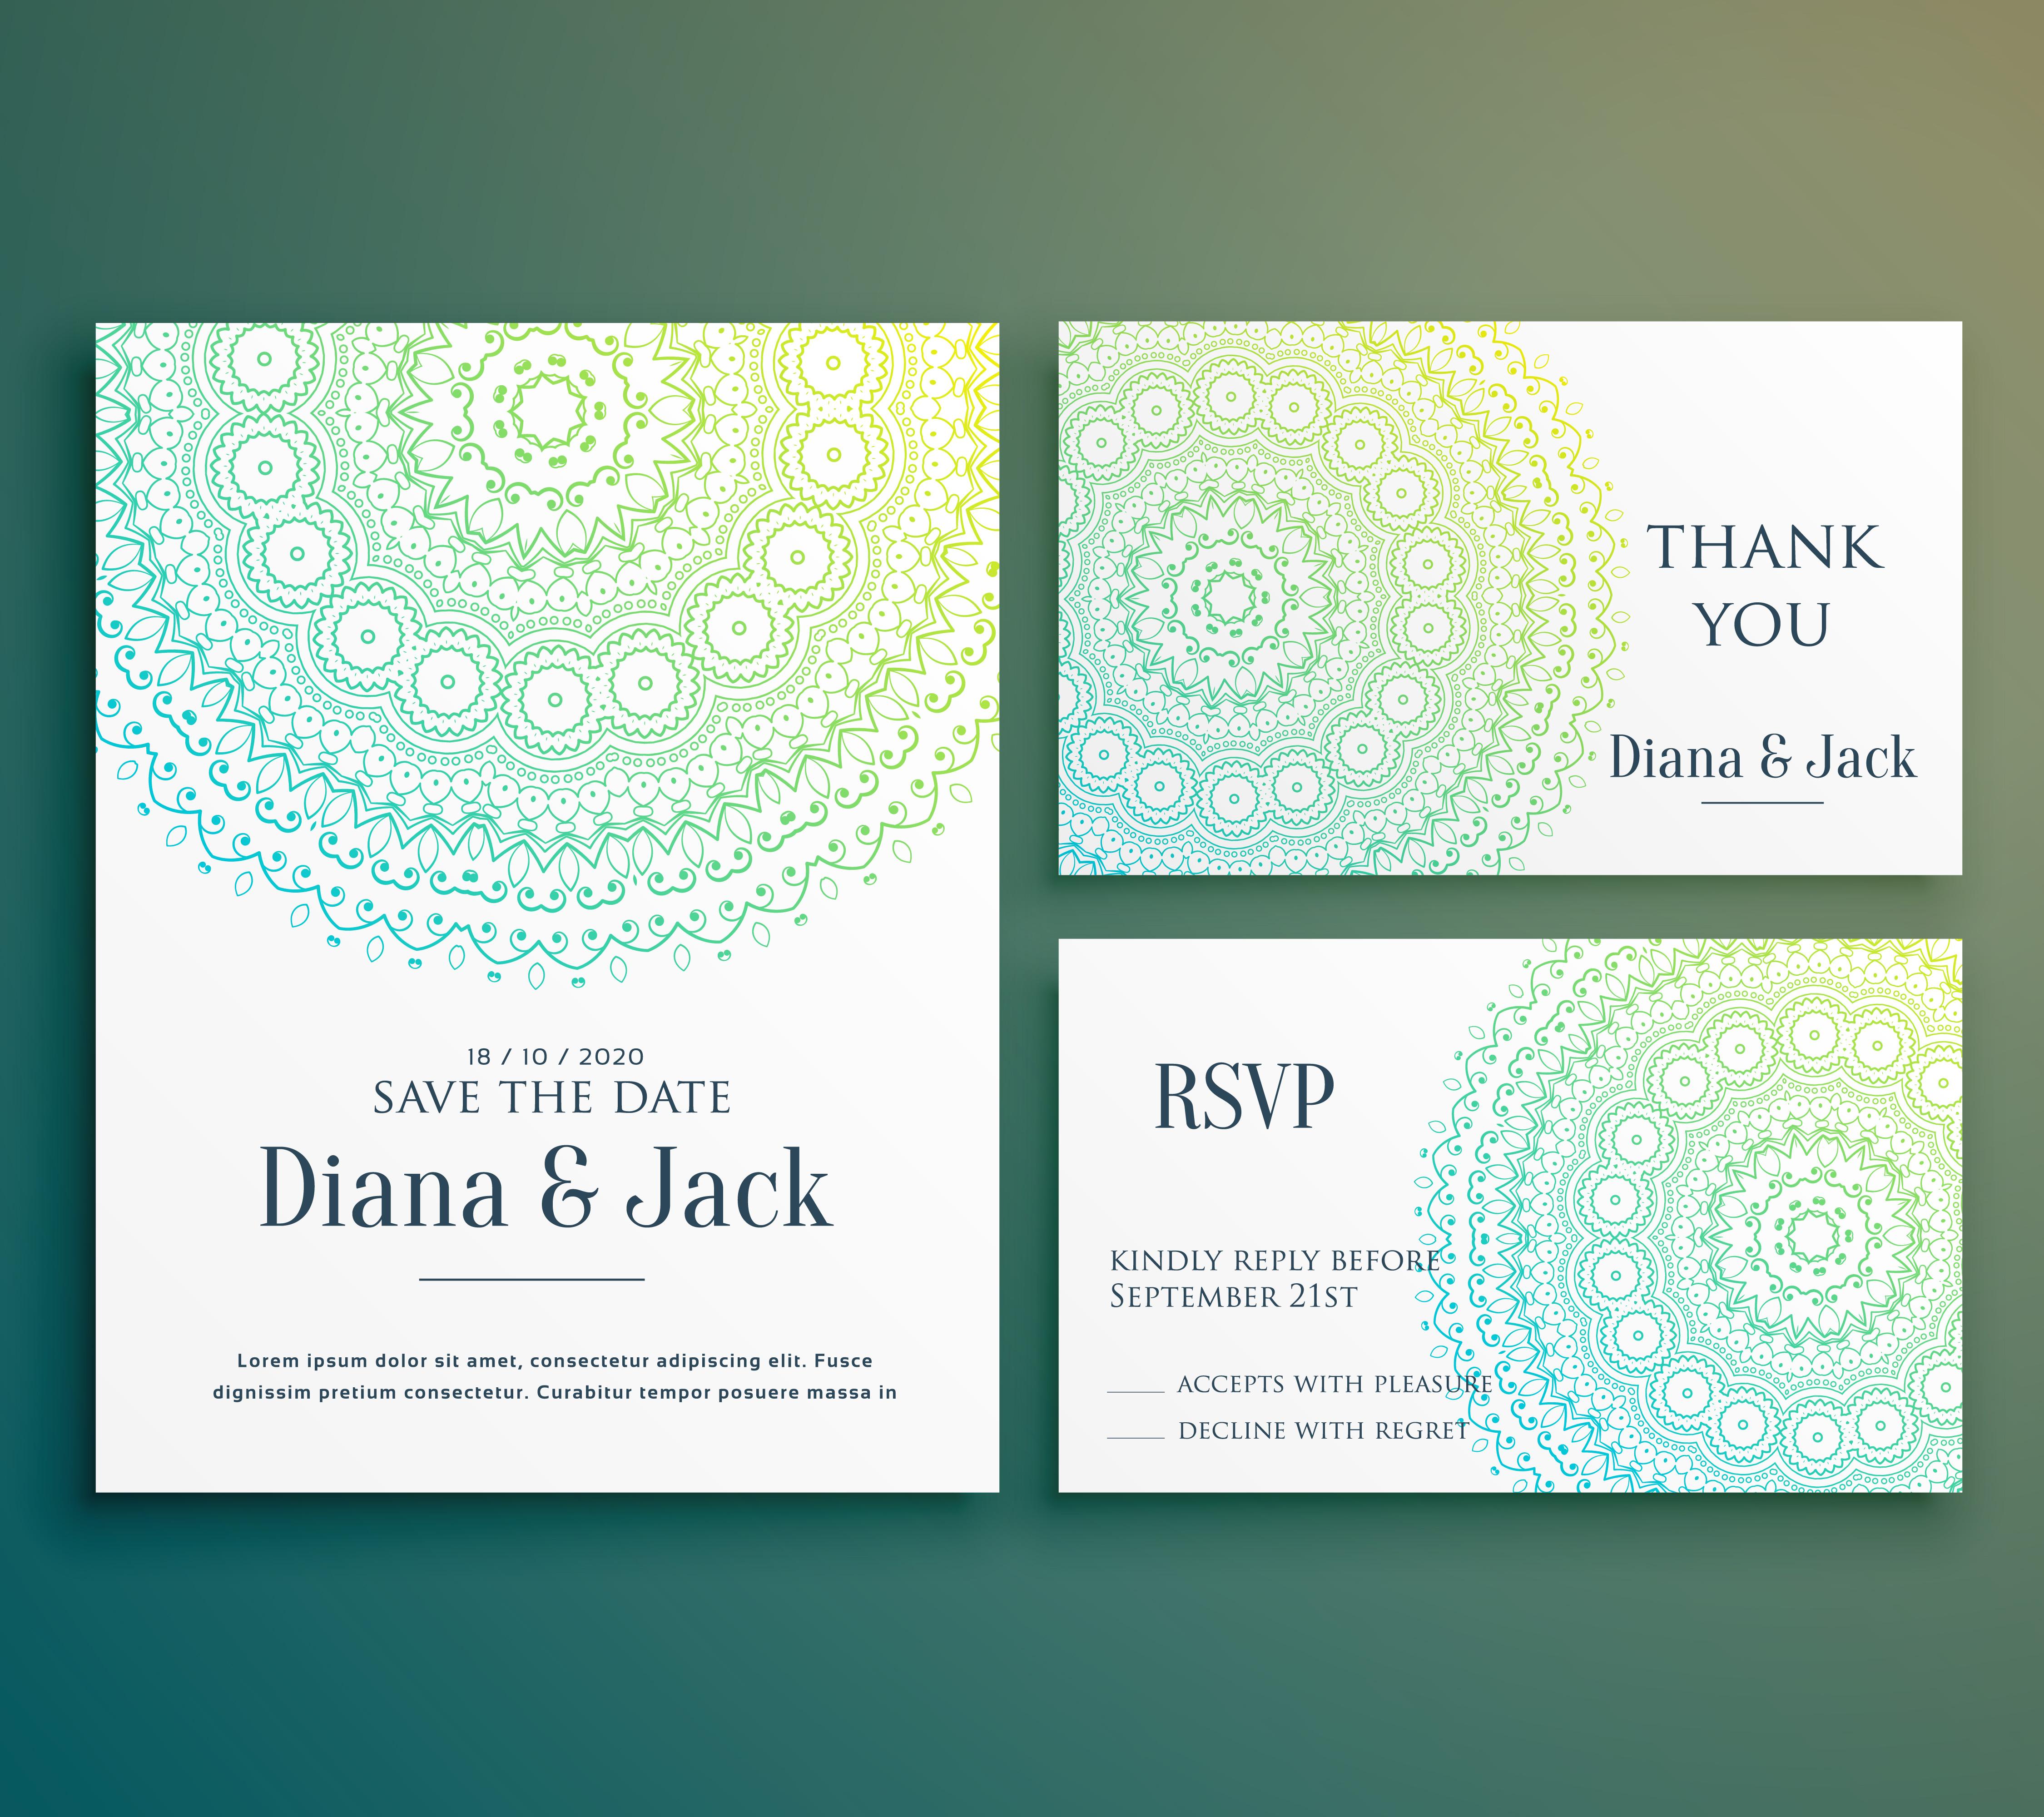 wedding invitation greeting card design with beautiful